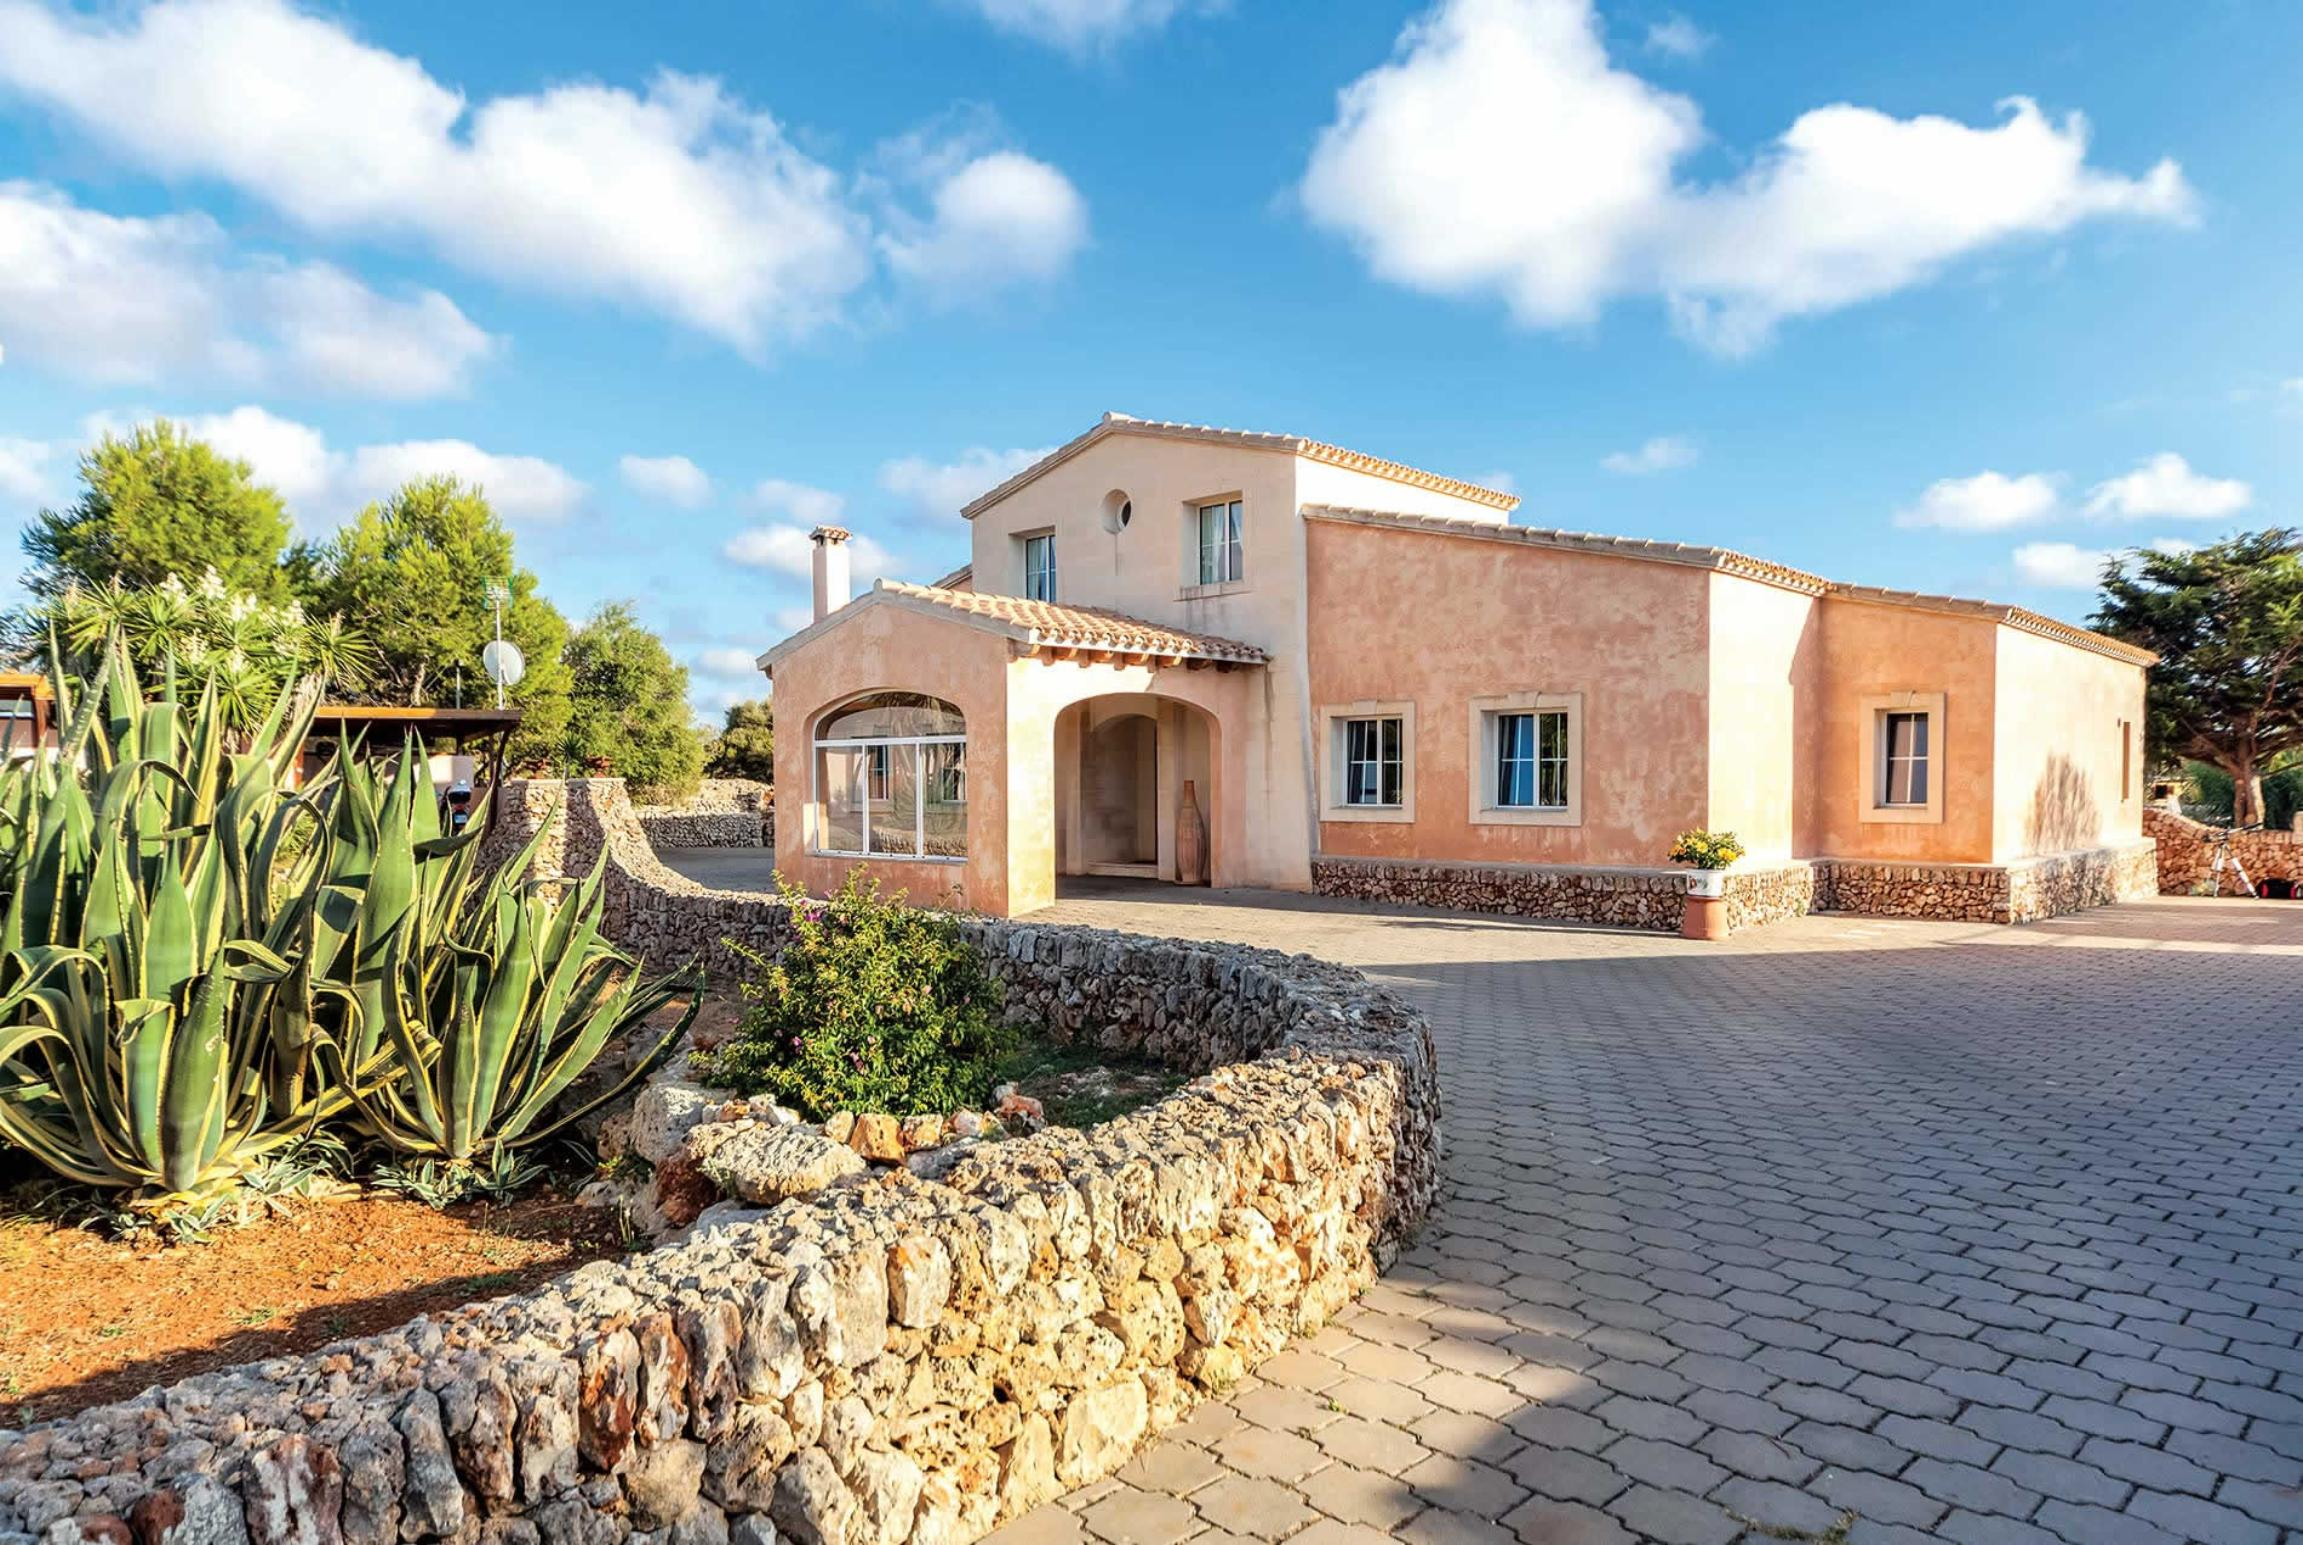 Ferienhaus Villa Estrellita (2649653), Punta Prima, Menorca, Balearische Inseln, Spanien, Bild 20